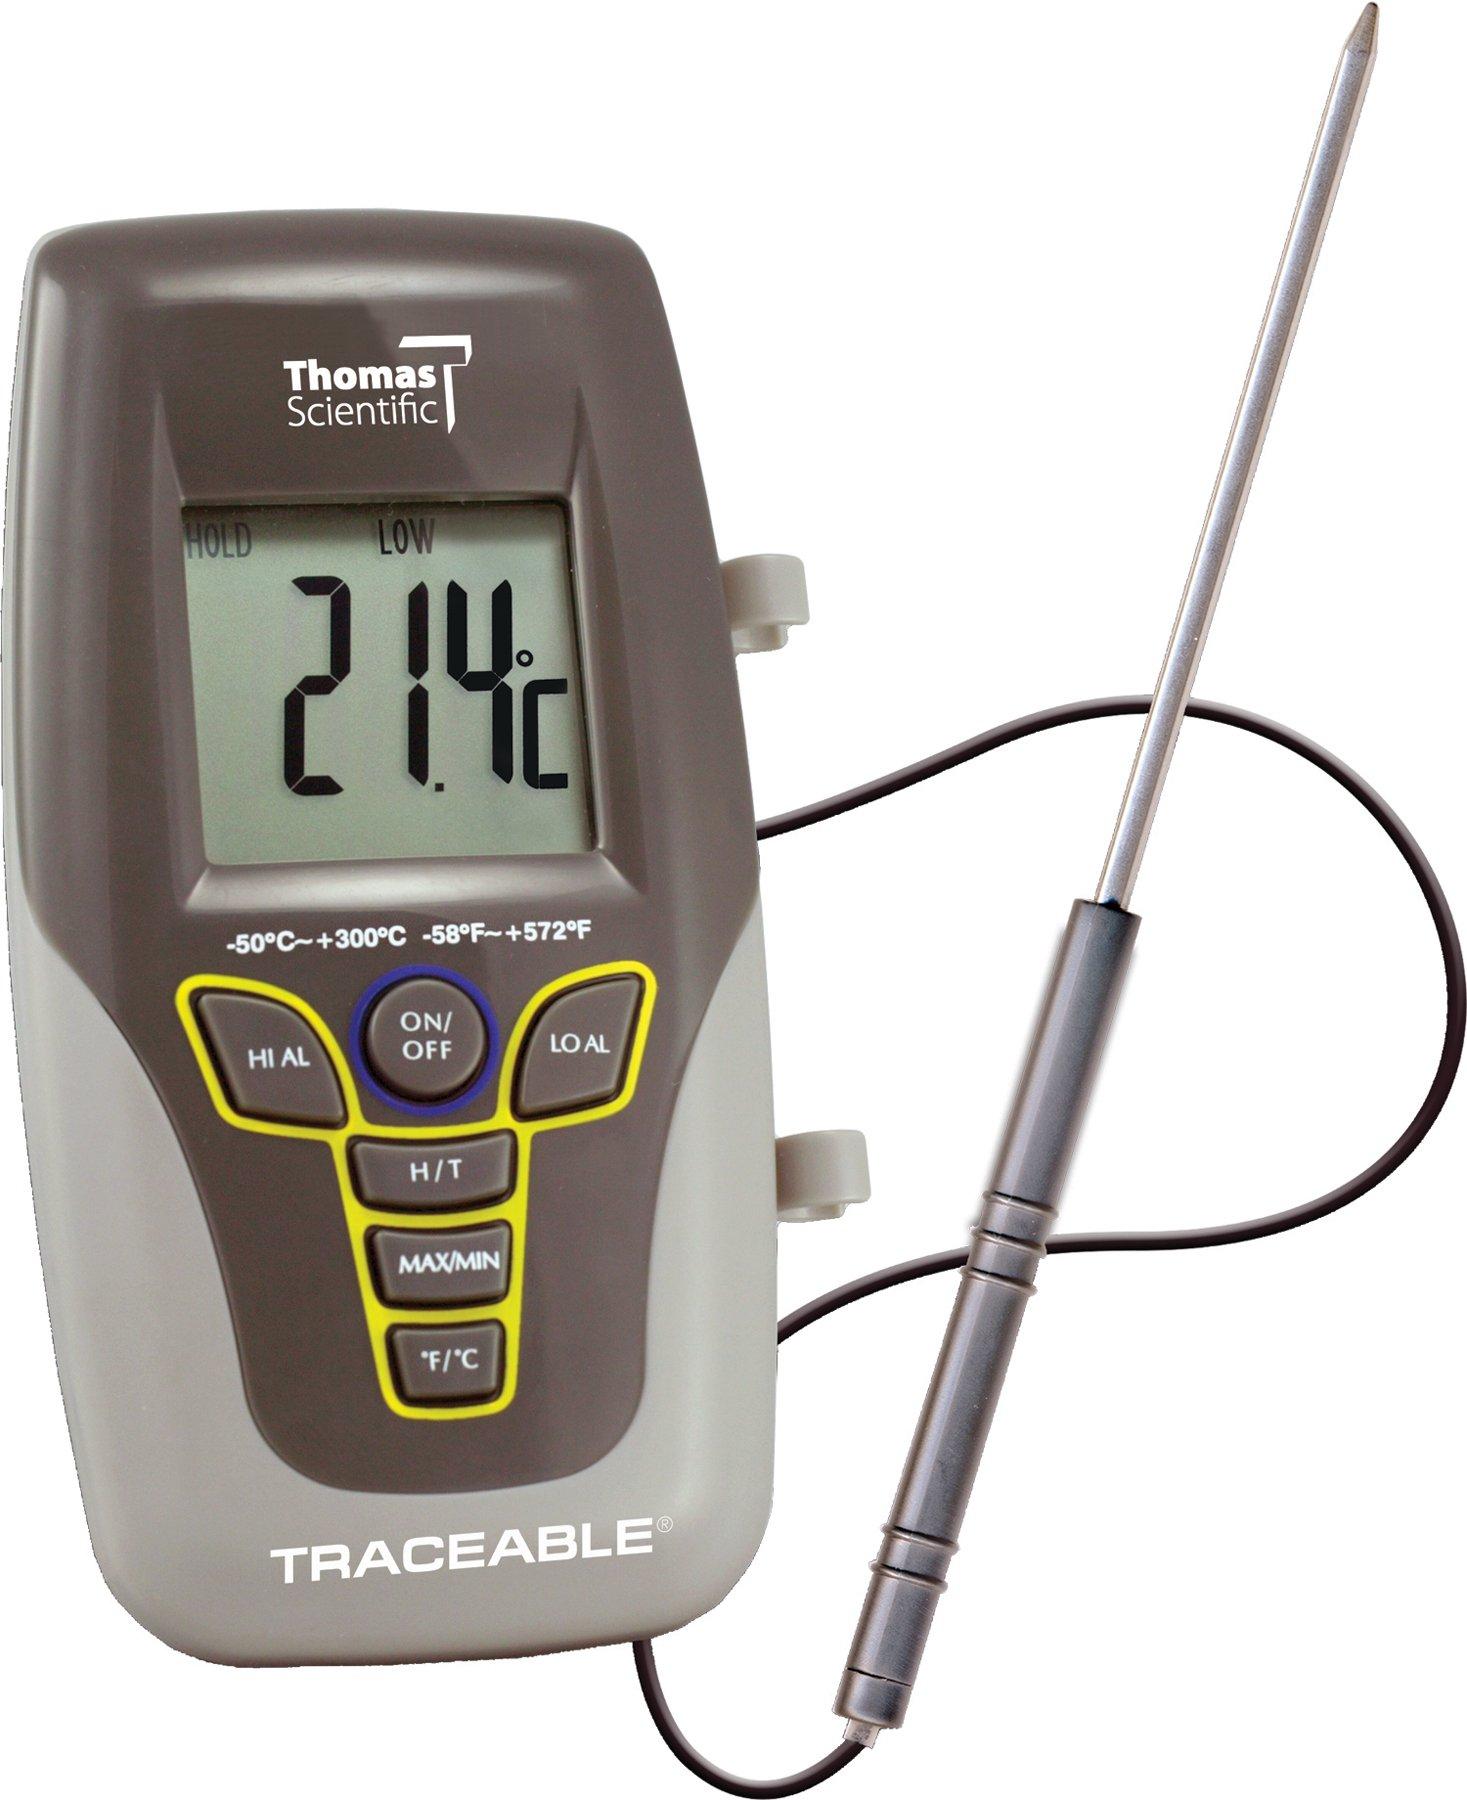 Thomas Traceable Kangaroo Thermometer, 7.5'' Probe Length, -58 to 572 degree F, -50 to 300 degree C by Thomas